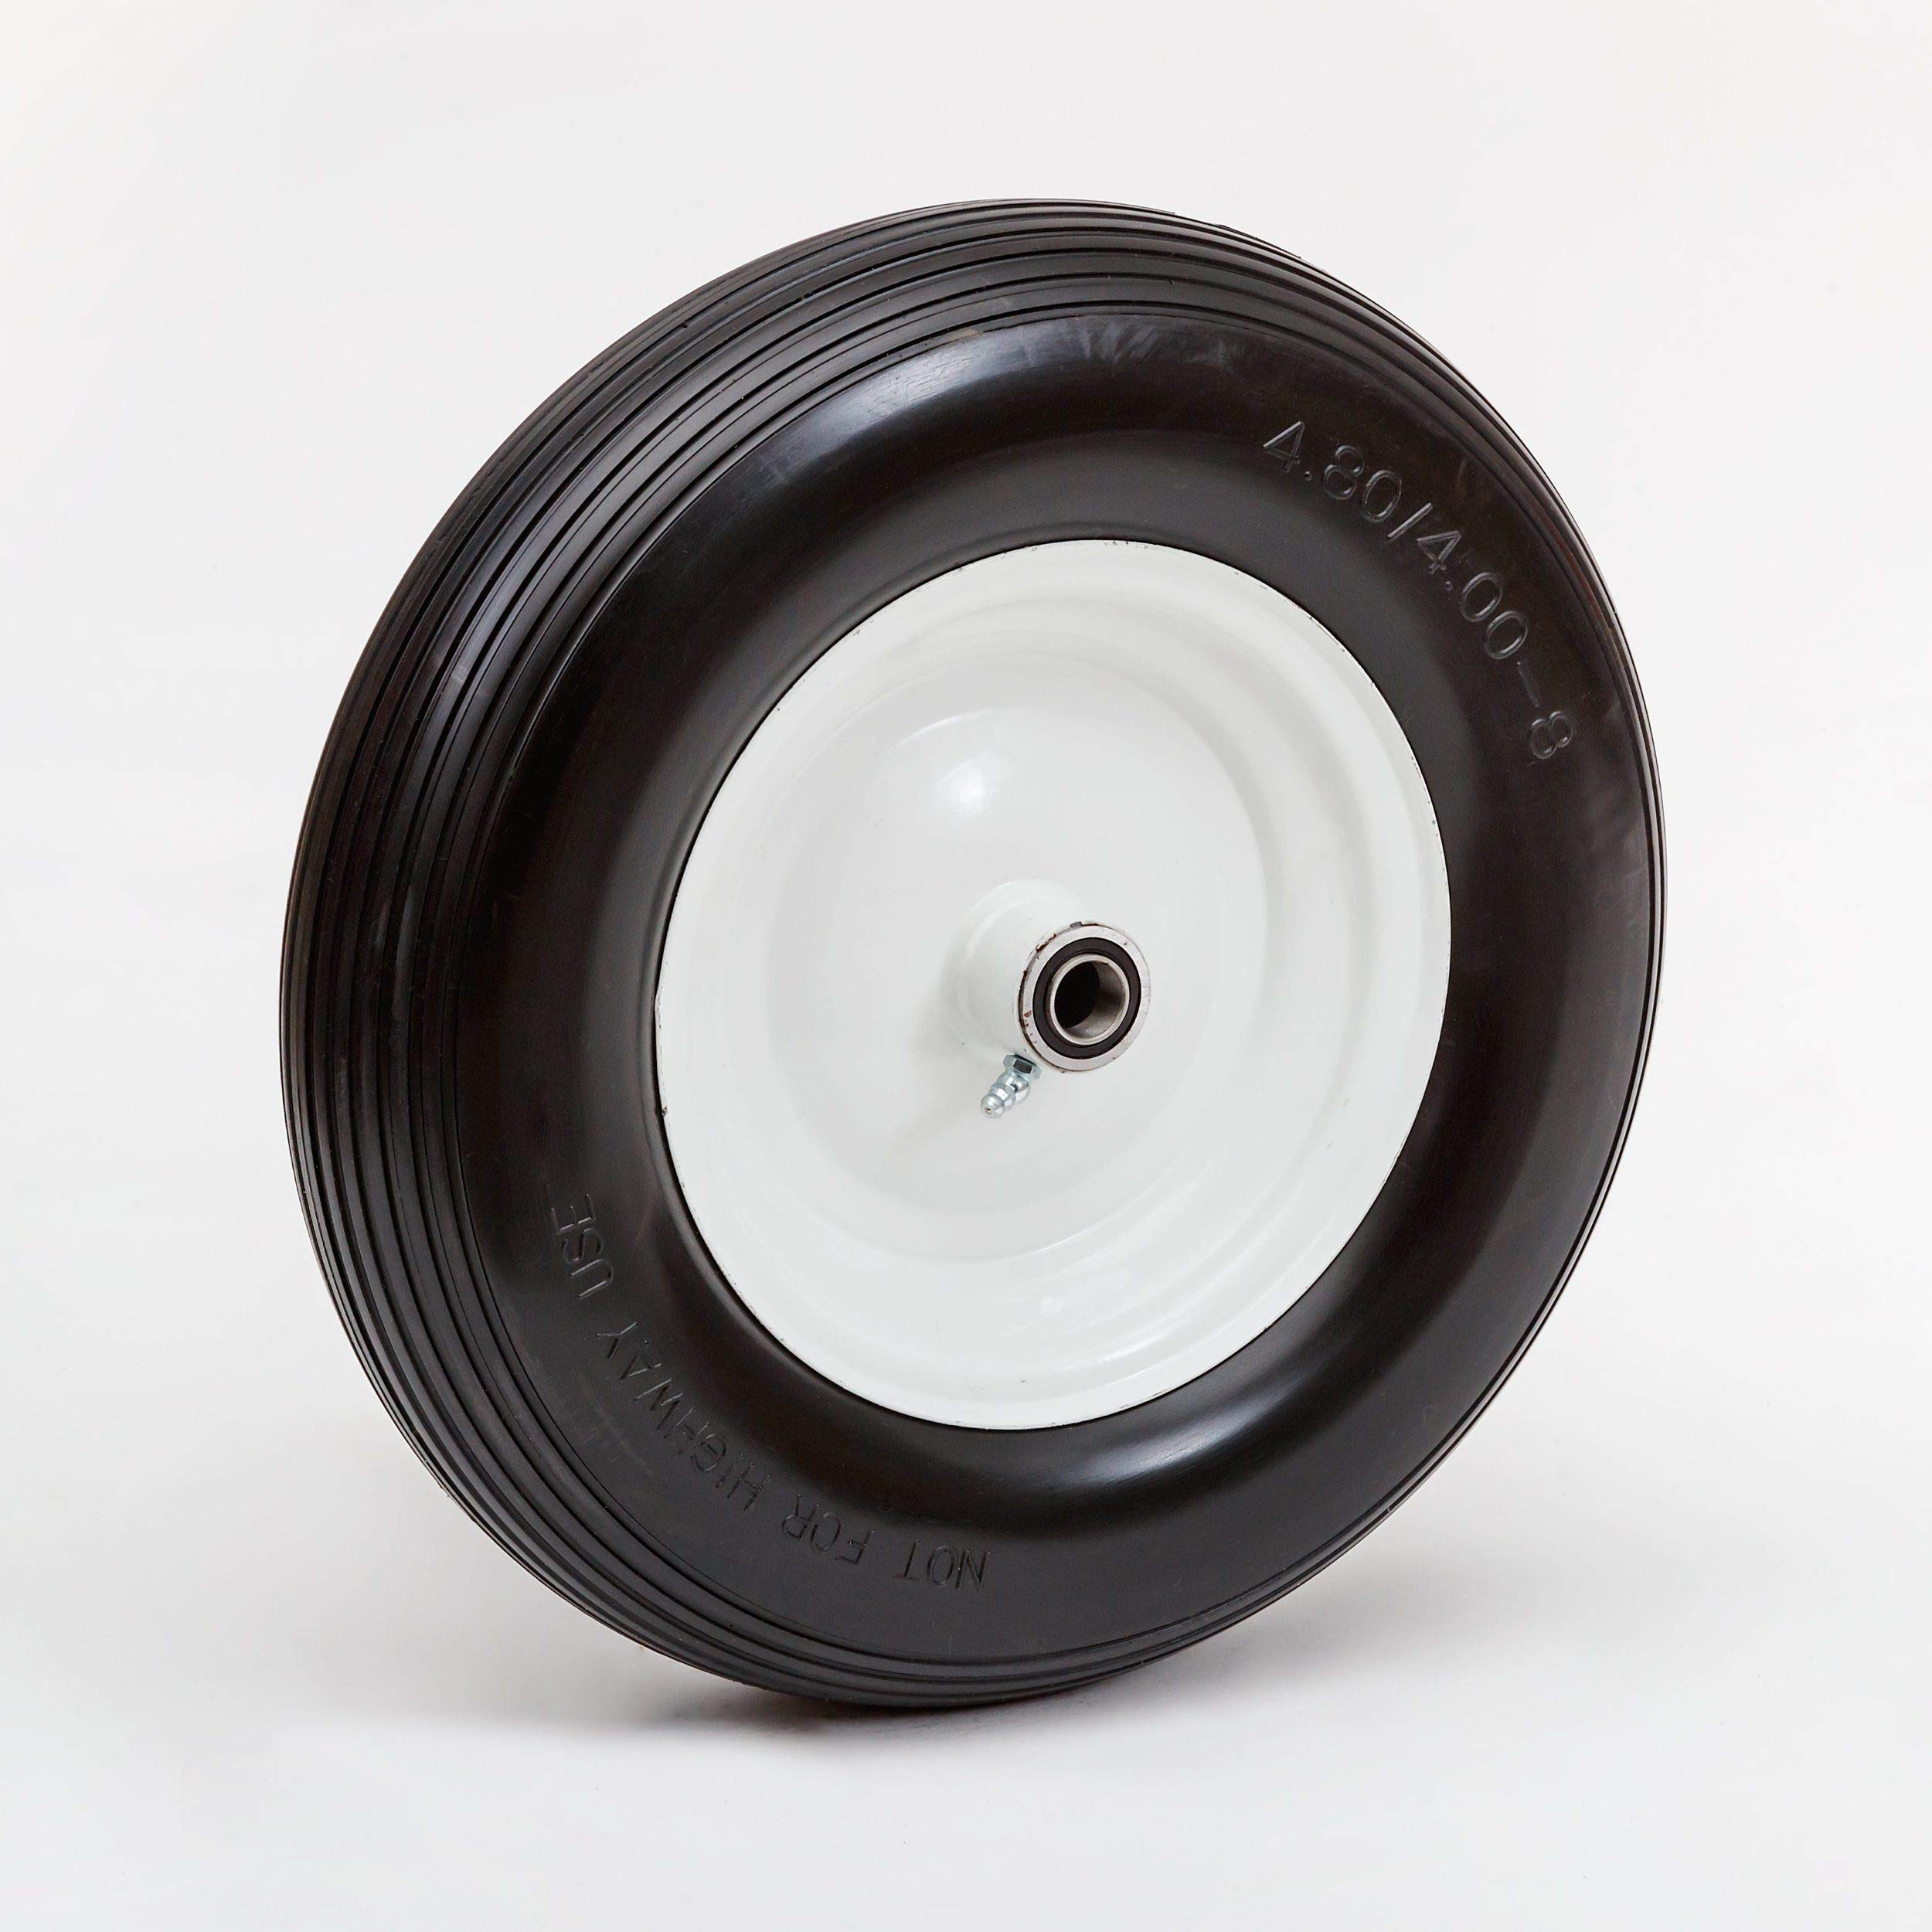 16'' Flat Free Wheelbarrow Tire, White Rim, Wheel/Hub/Bearing Size Options, Ribbed Tread Pattern by Lapp Wheels